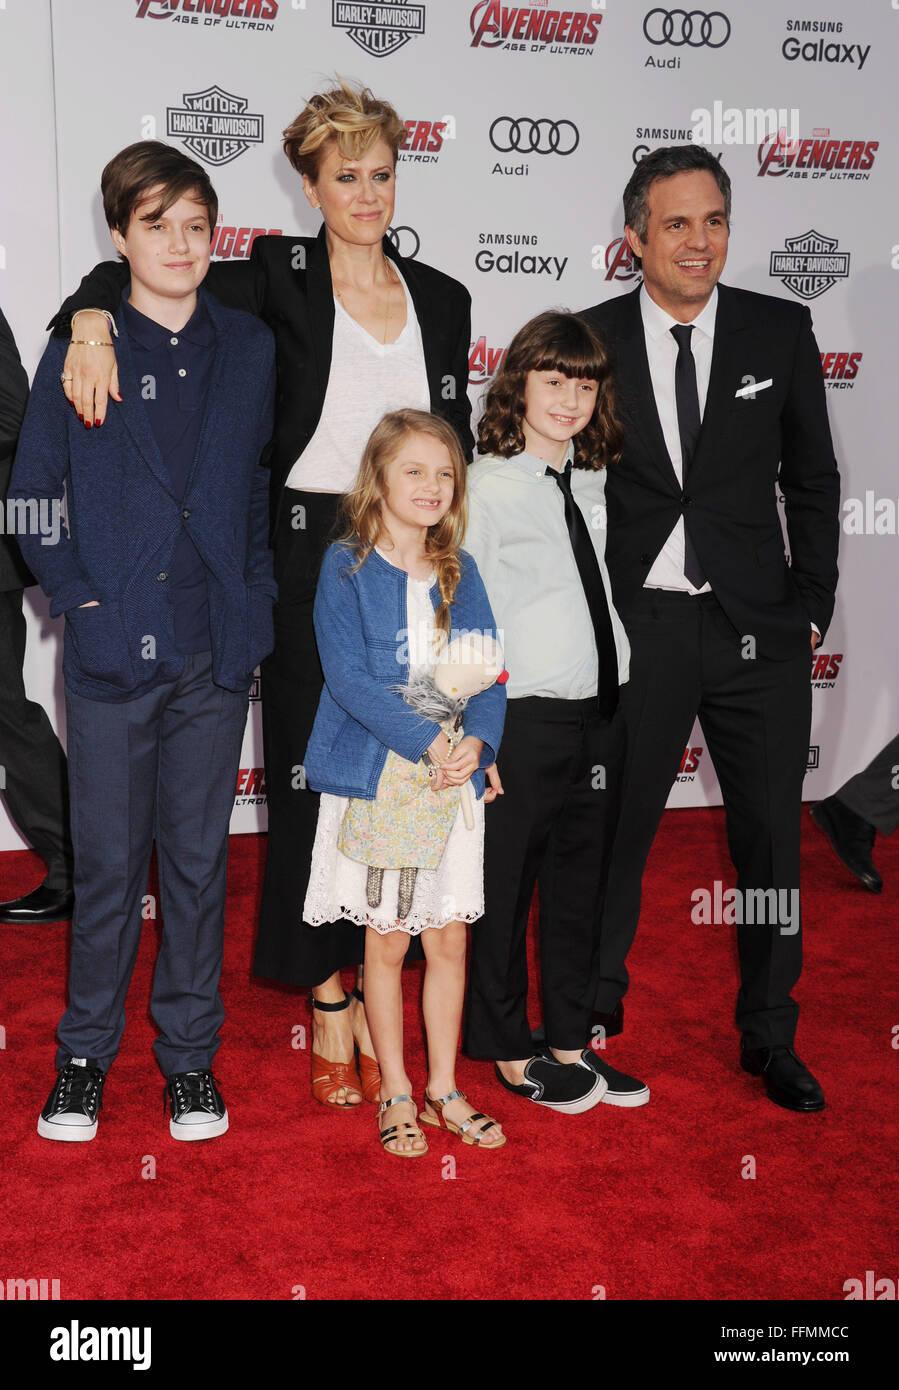 Actor Mark Ruffalo (R) and wife Sunrise Coigney (C) and family arrive Stock Photo: 95726748 - Alamy